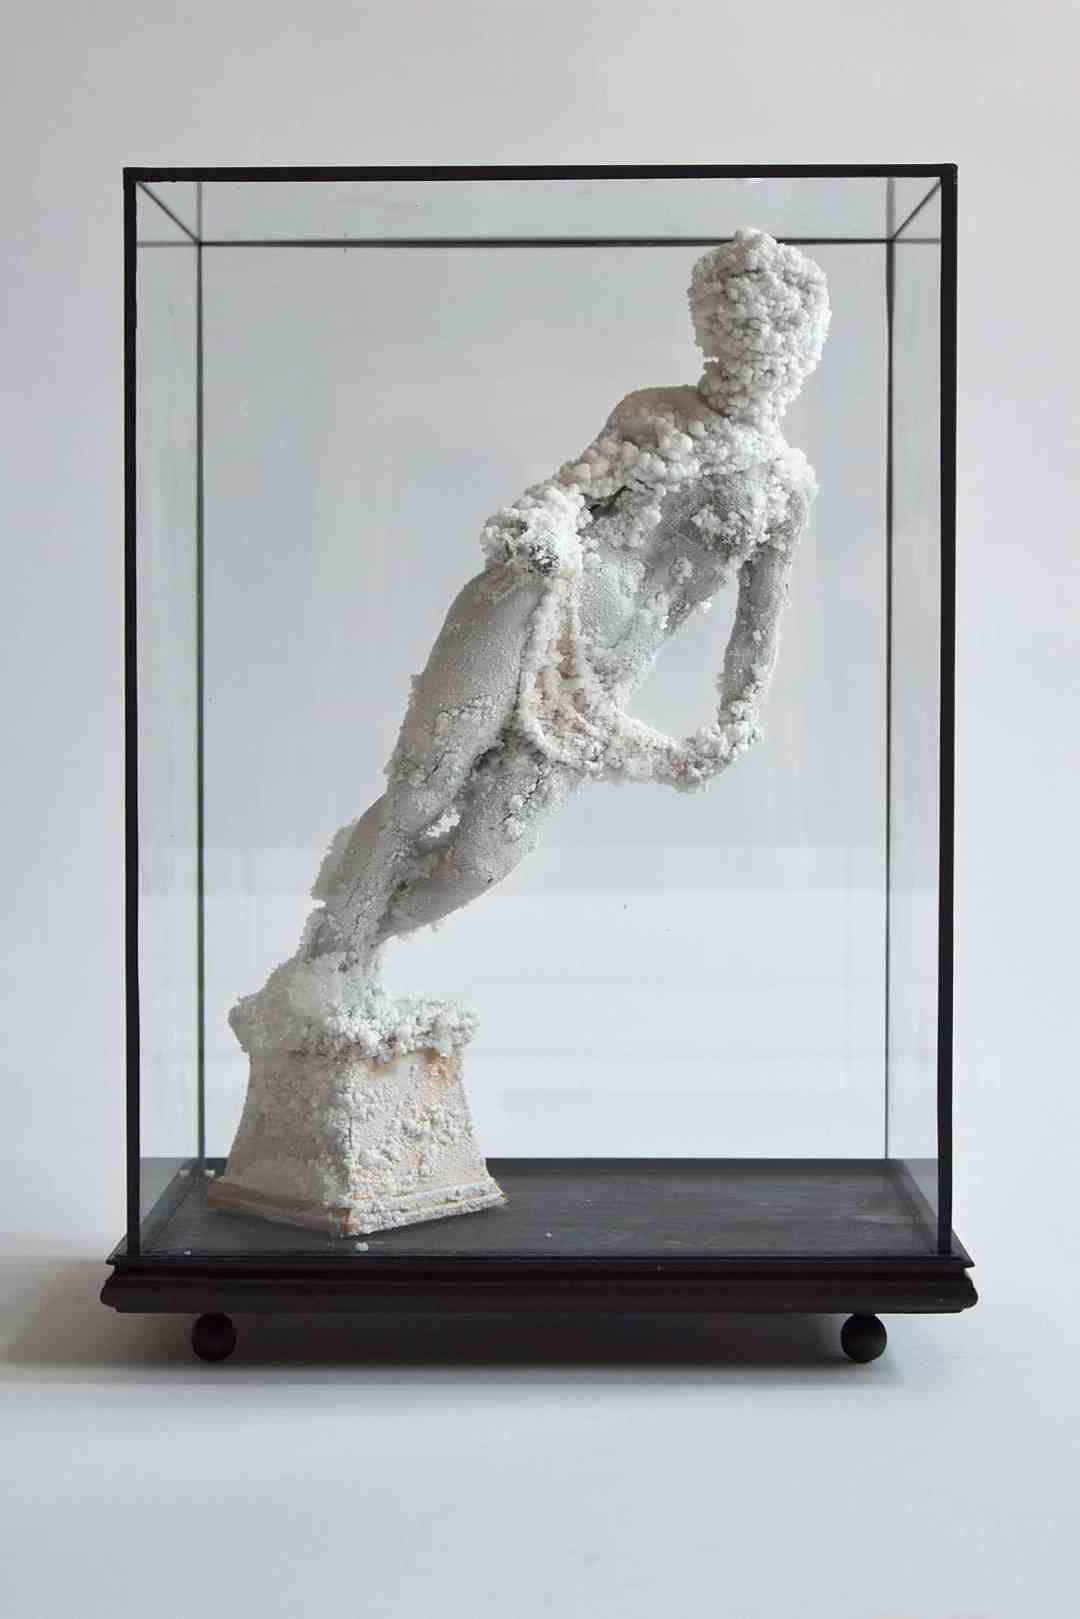 Wojciech Ireneusz Sobczak, Lukrecja from the Laborathory series, 2018, sculpture